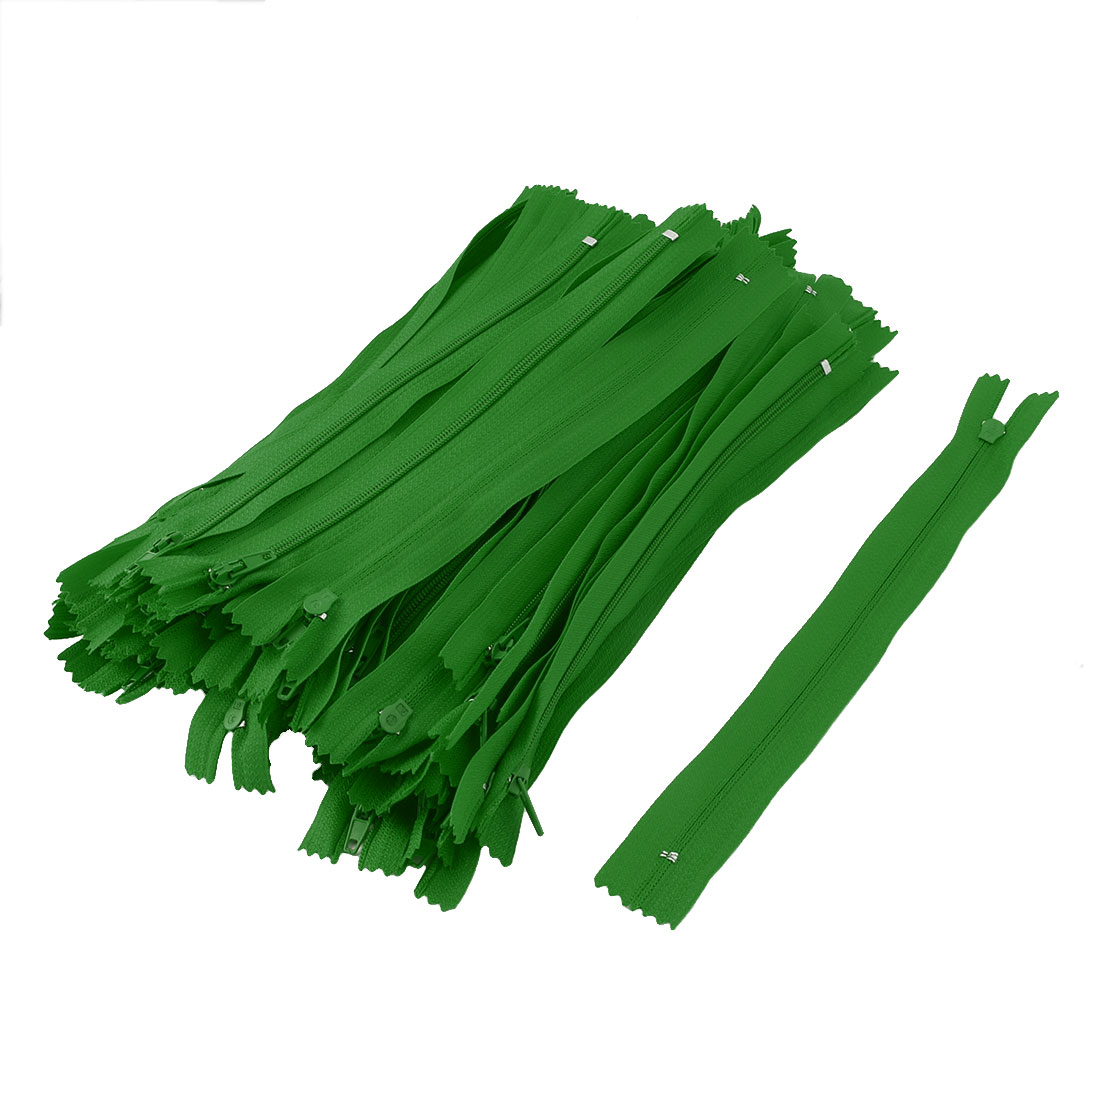 Tailoring Nylon Handcraft Sewing Pants Bag Zipper Green 9 Inch Length 100pcs